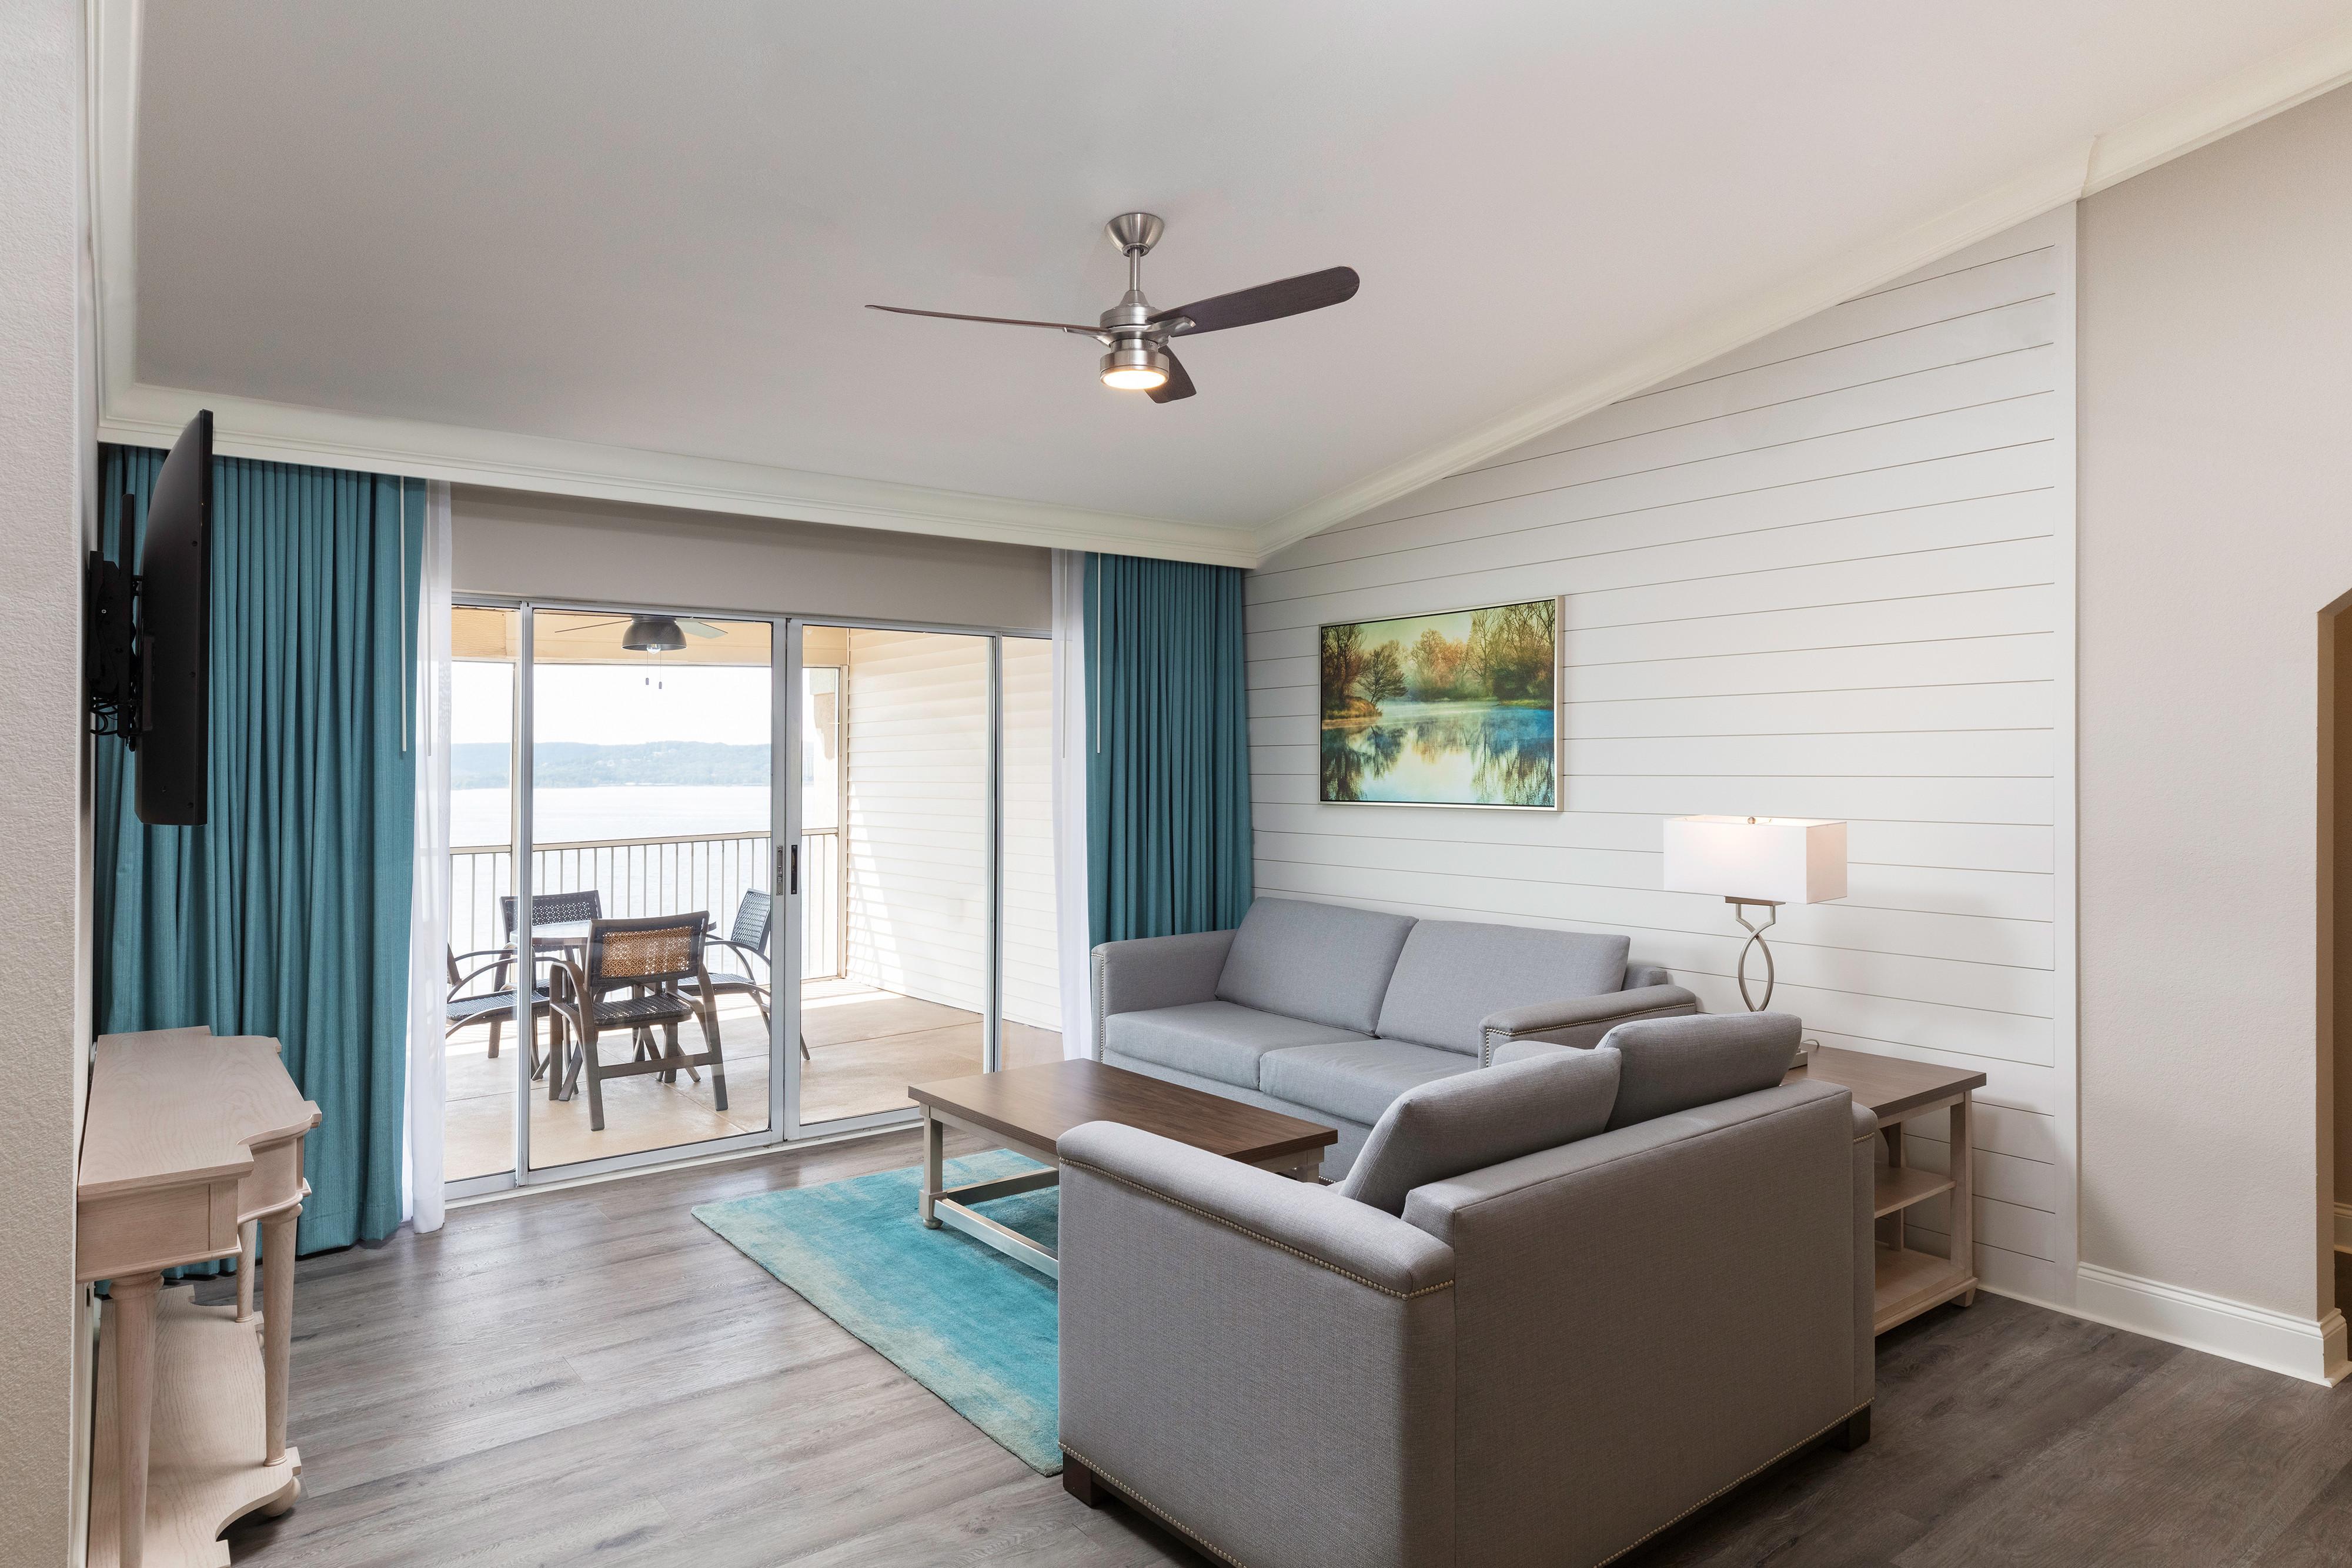 1 Bedroom Villa Suites at our Branson Resort | Living Area in One-Bedroom Deluxe